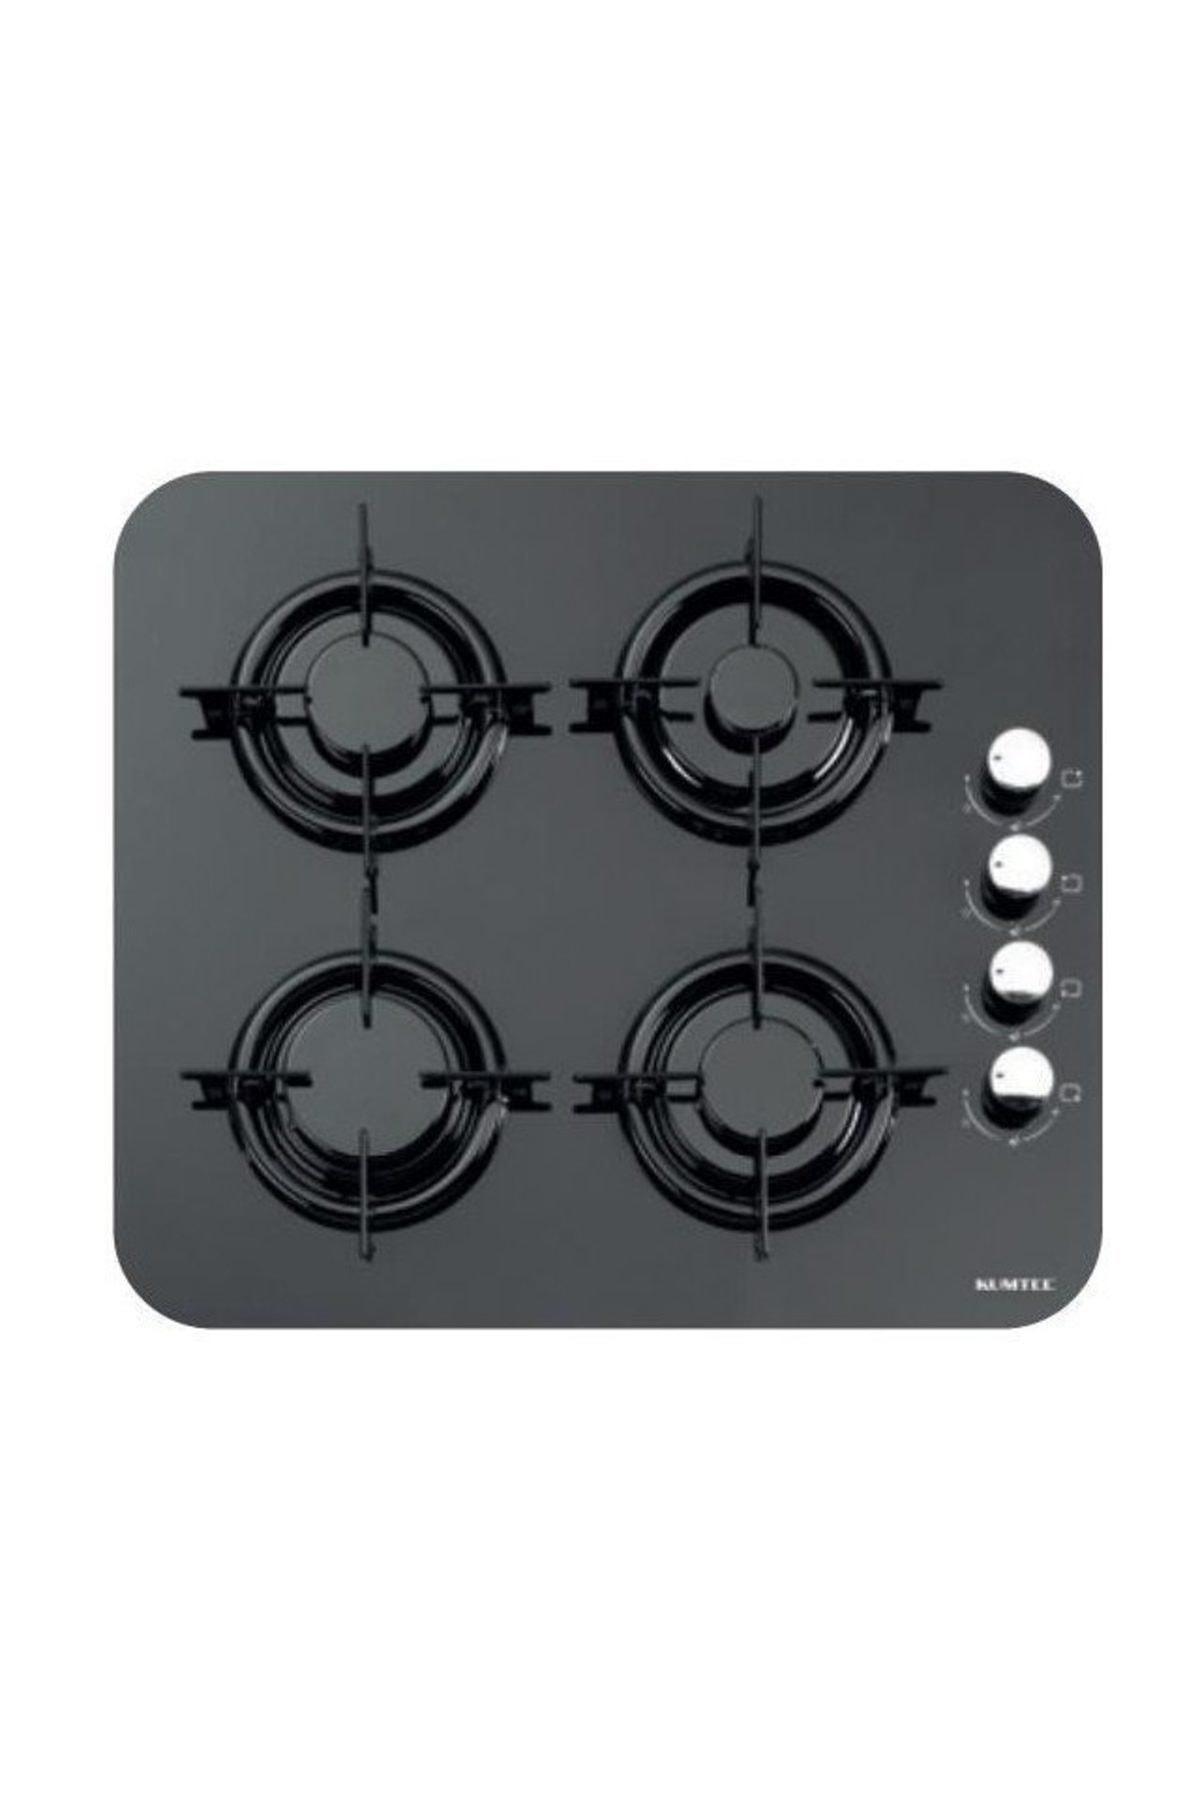 KUMTEL Siyah İkili Oval Cam Ankastre Set (DA6 830 Davlumbaz + 40 TSHDF Oval Cam Ocak) 2